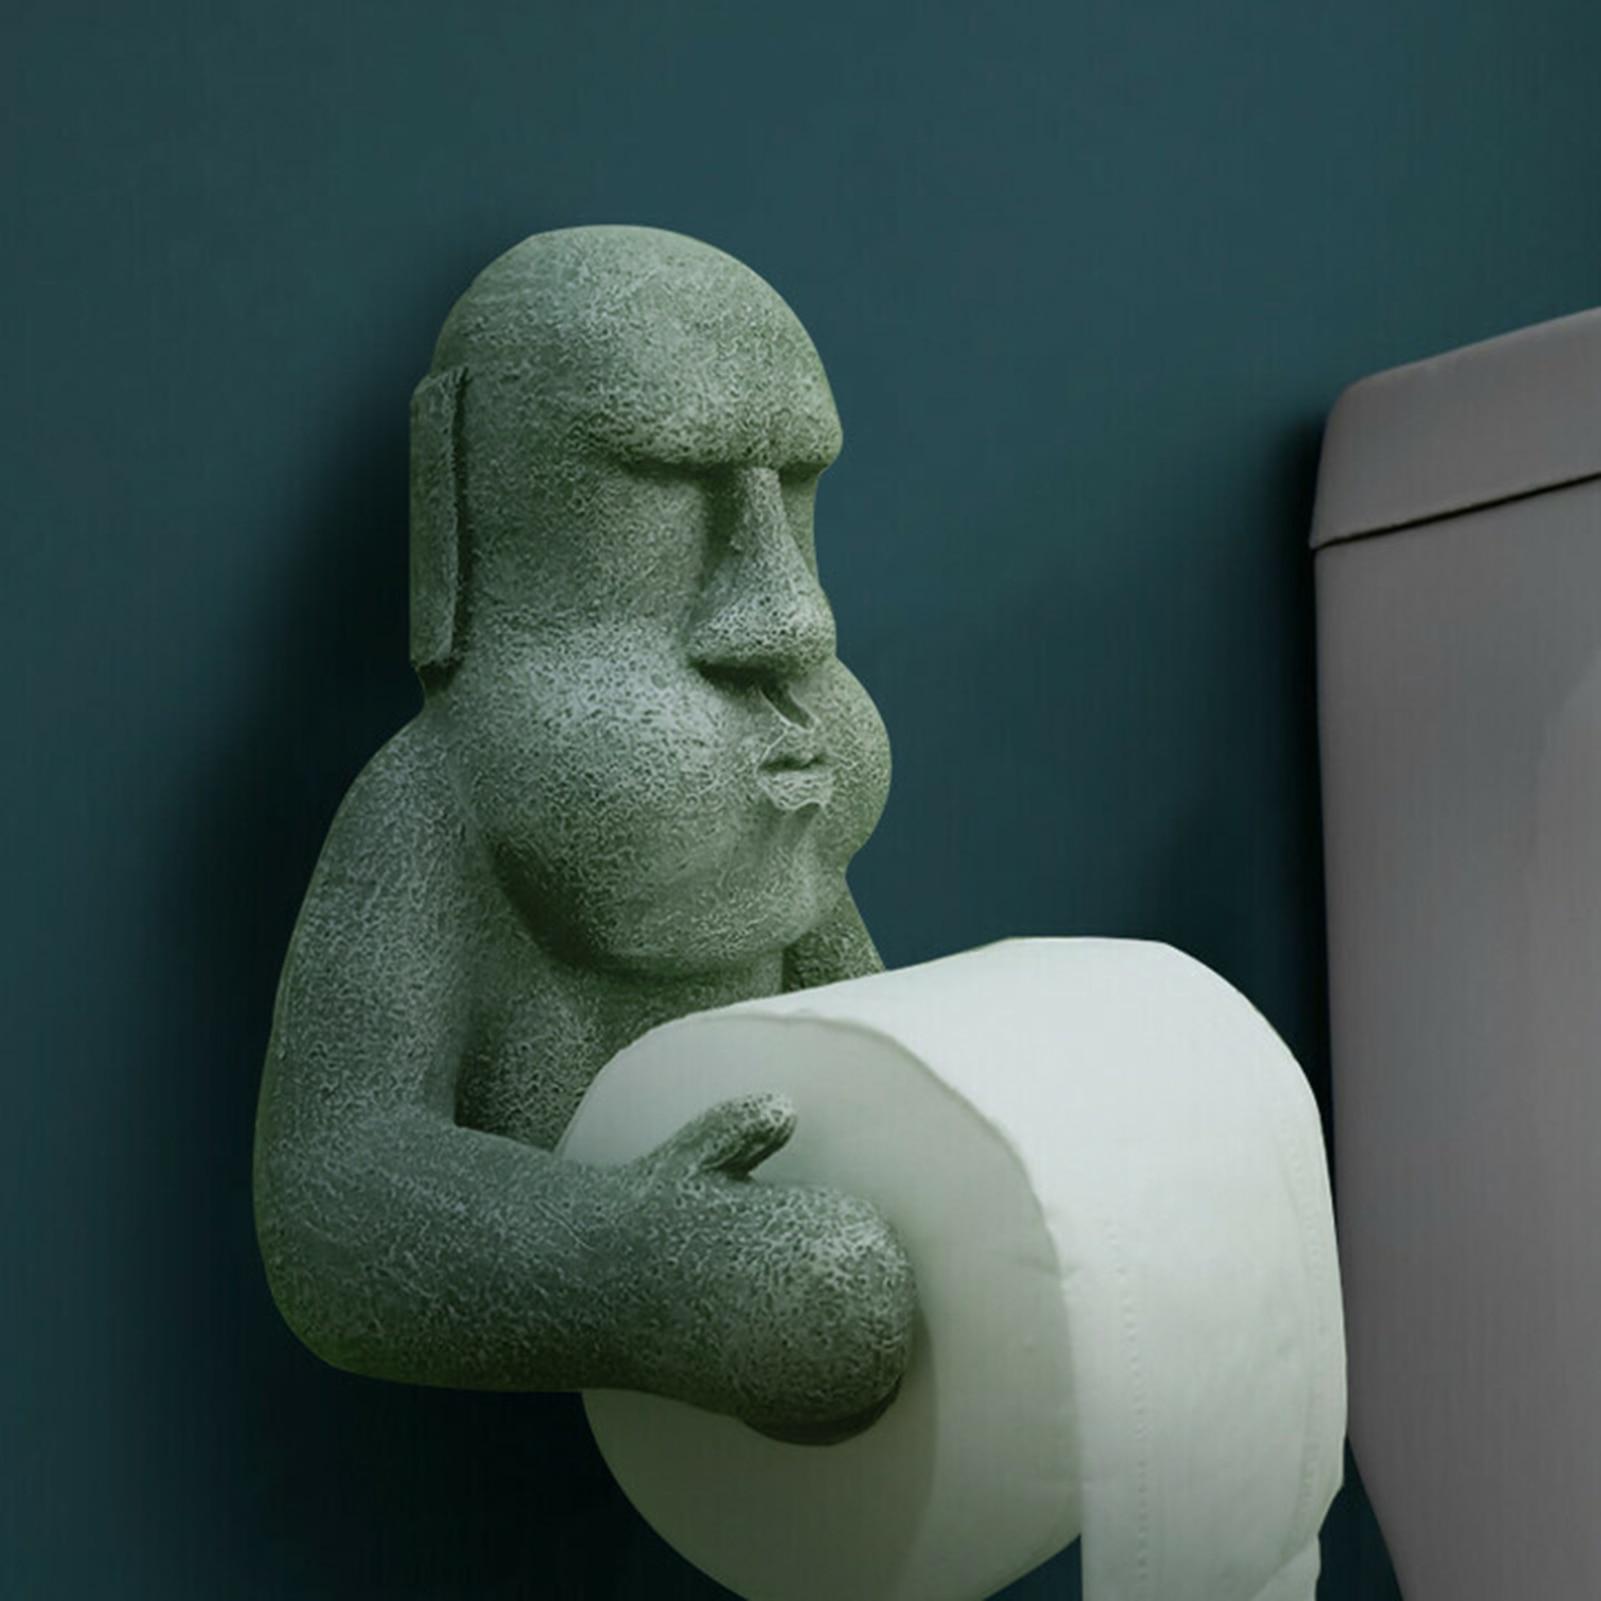 Toilet Paper Holder Easter Tissue Holder Towel Hanger Organizer Mount Bathroom Wall-mounted Tissue Holder Creative Toilet Roll